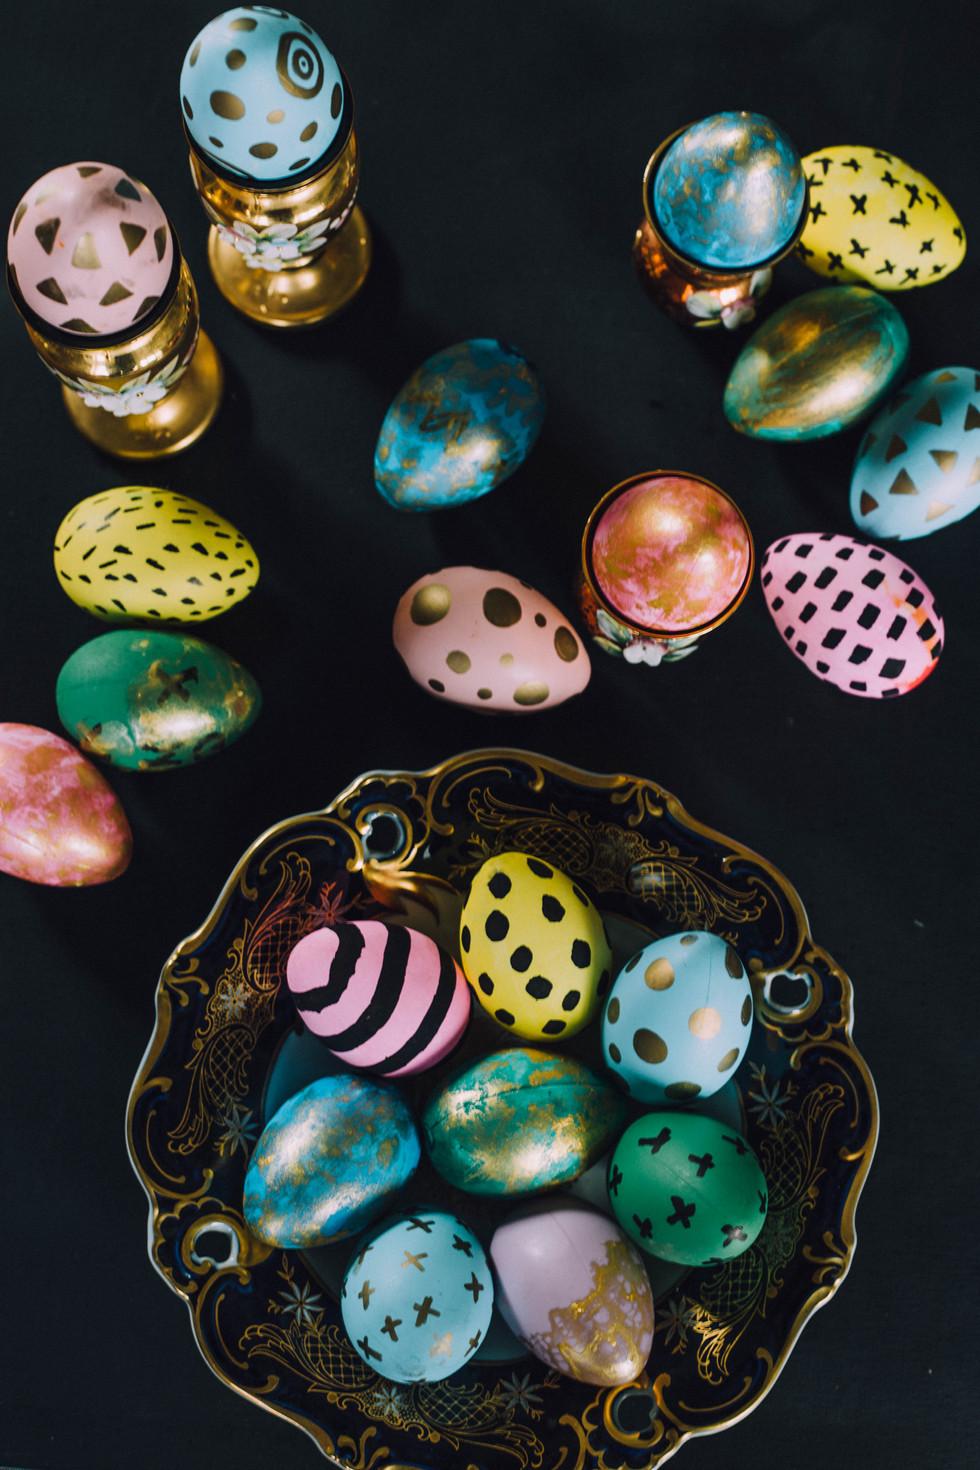 Still life photo of Easter eggs